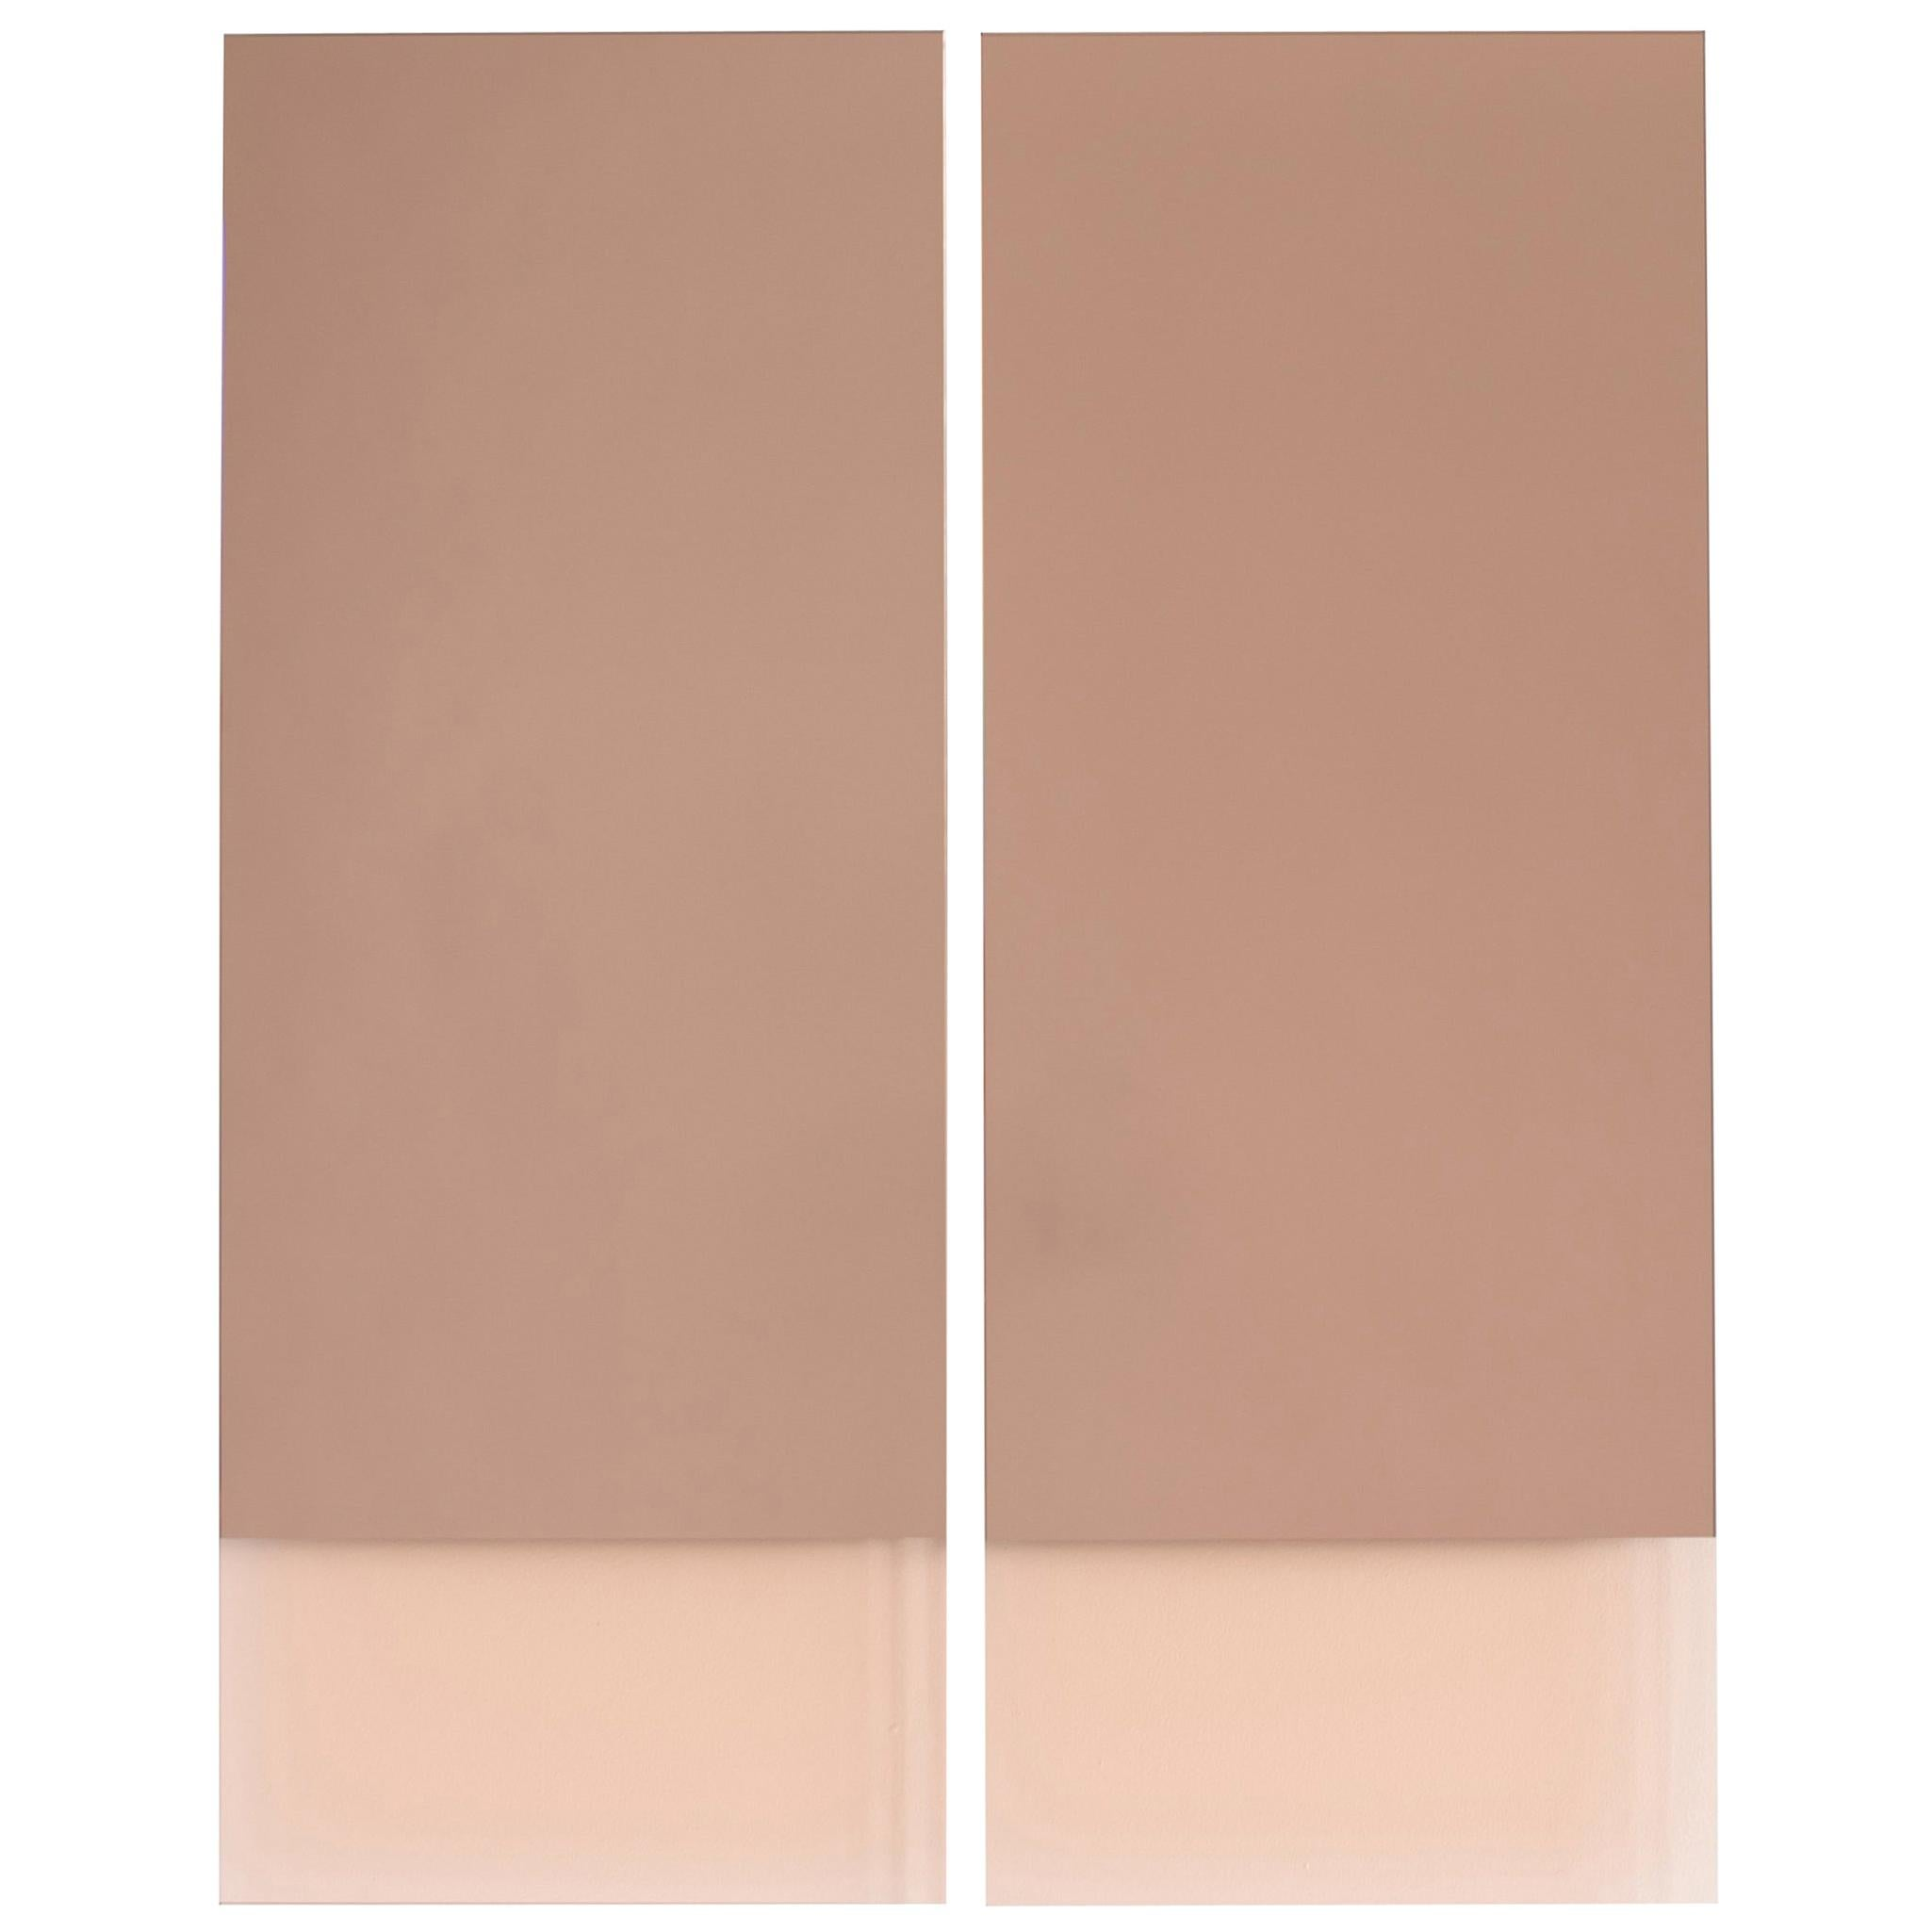 Rectangular Vanity Mirror, Contemporary IDA Mirror No. 4 by Ben & Aja Blanc